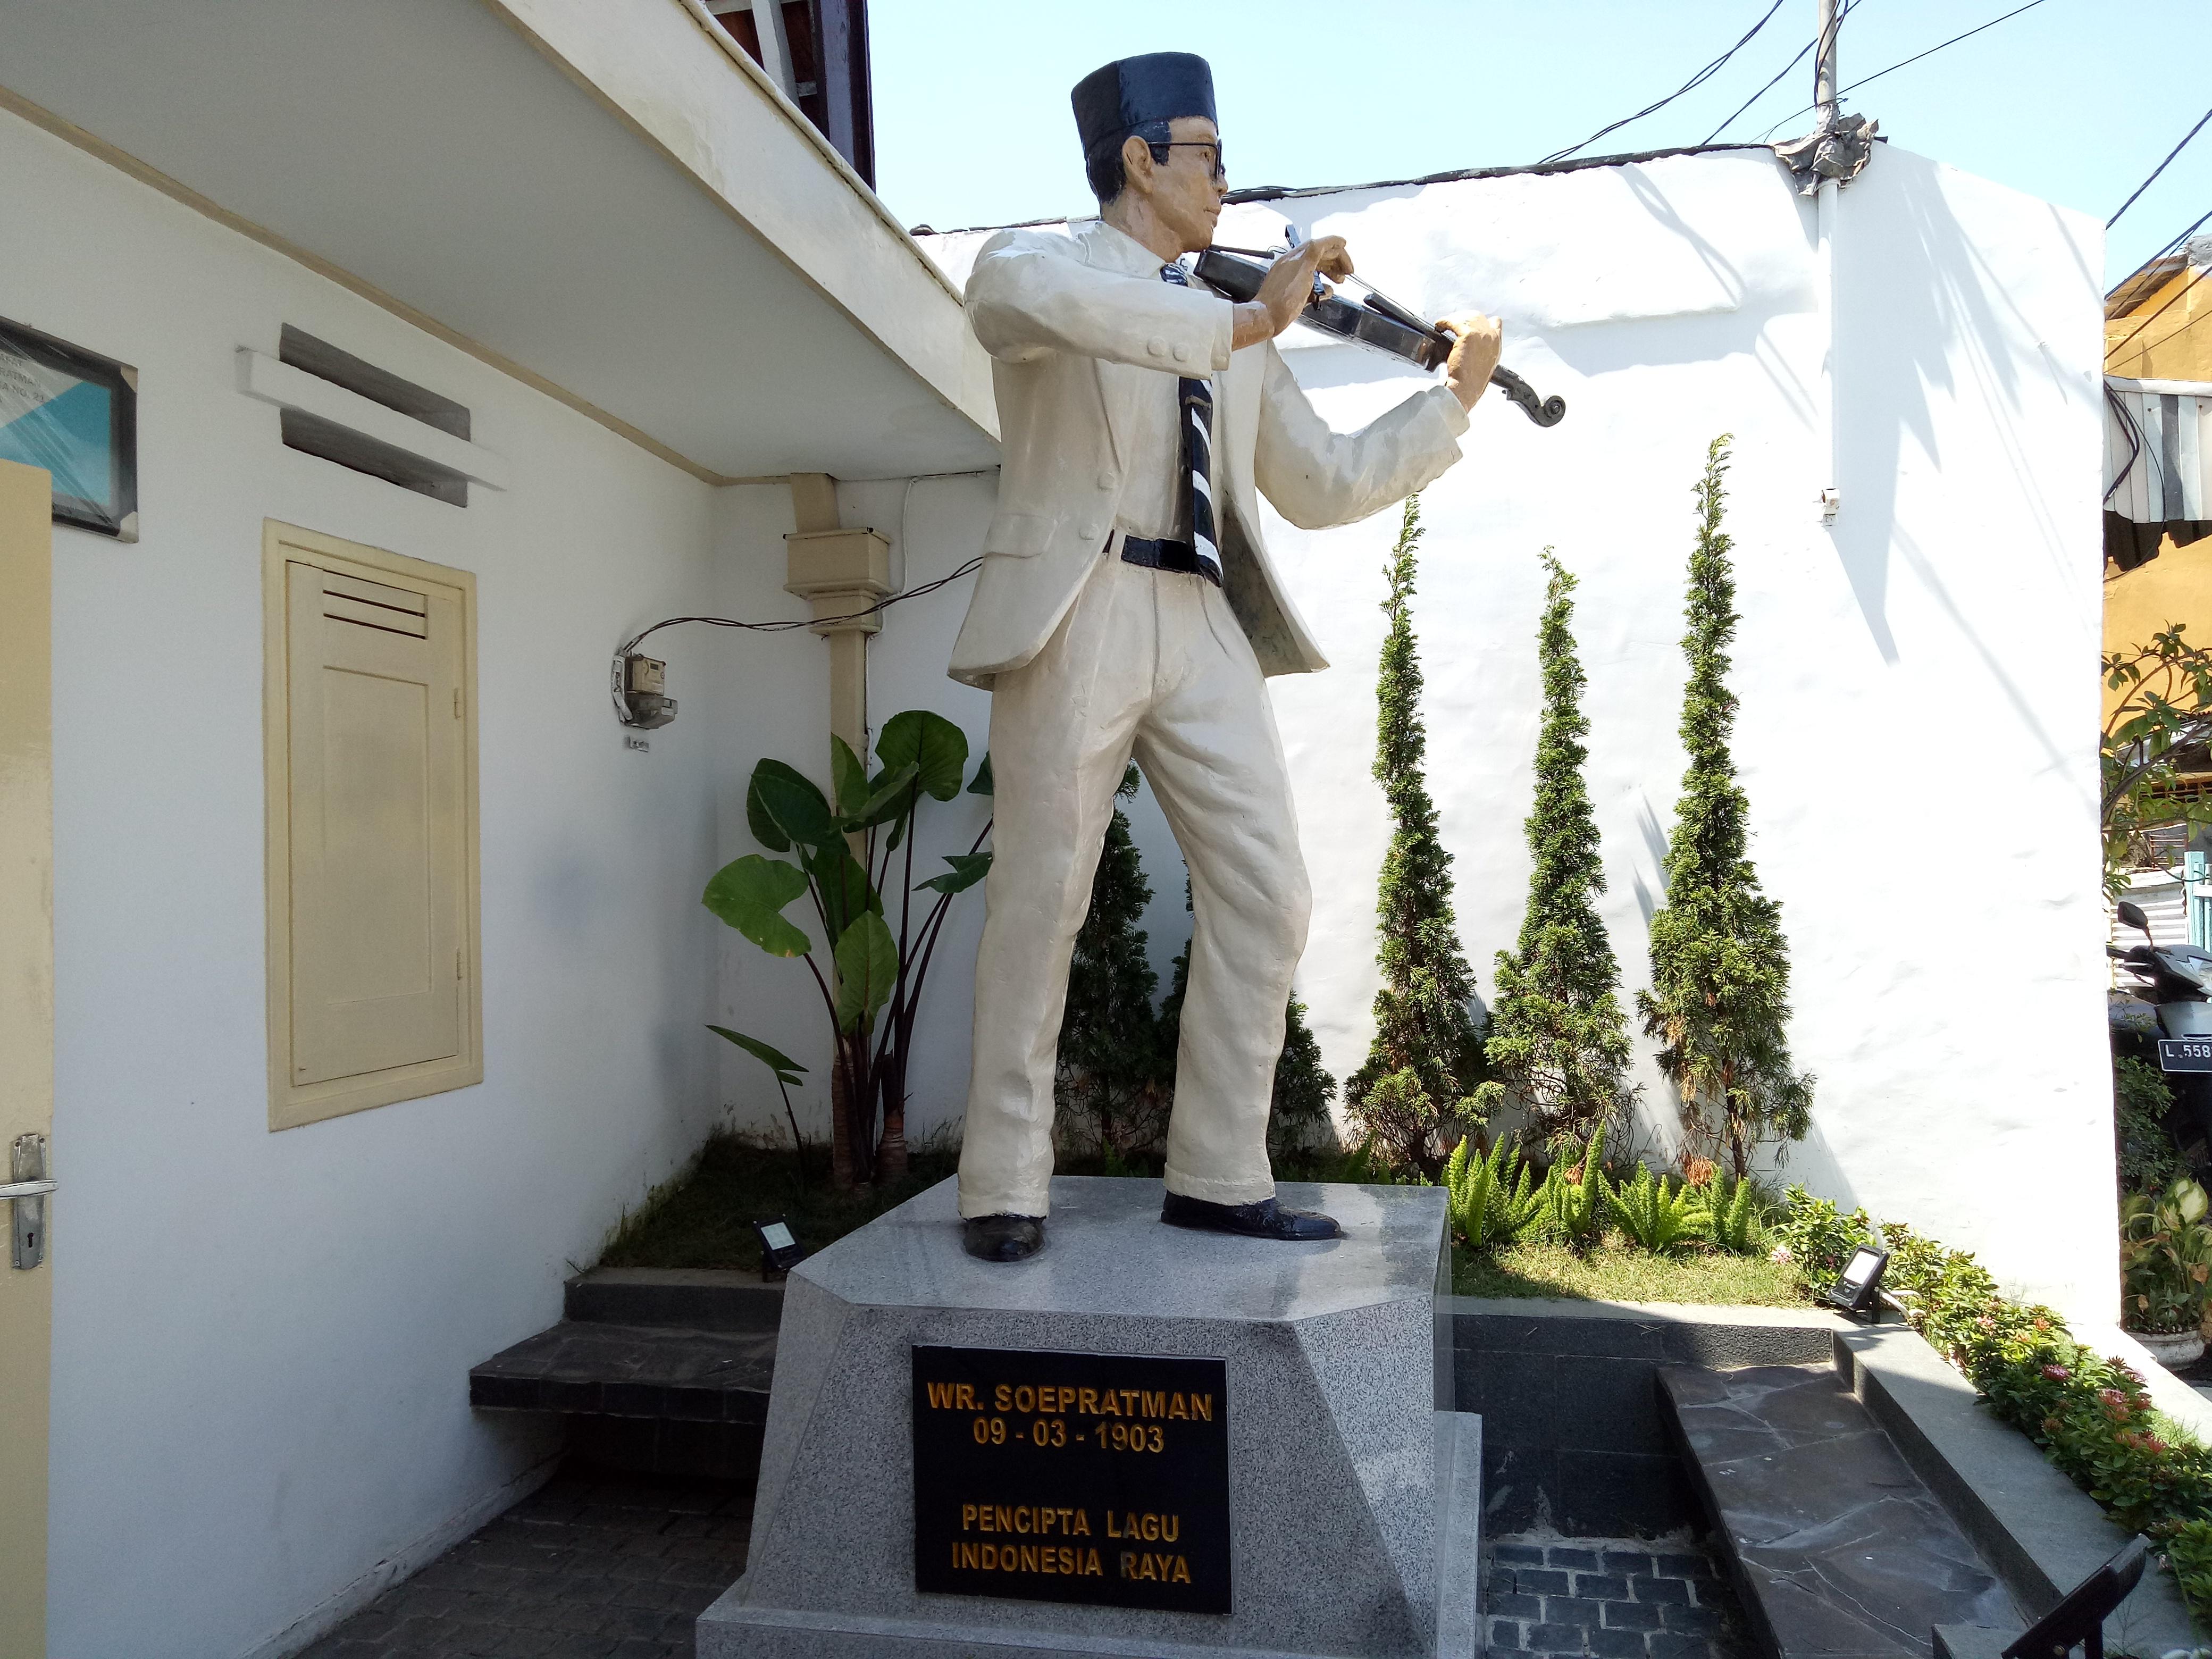 Melihat Rumah Wafat Wr Soepratman Surabaya Patung Depan Wisata Museum